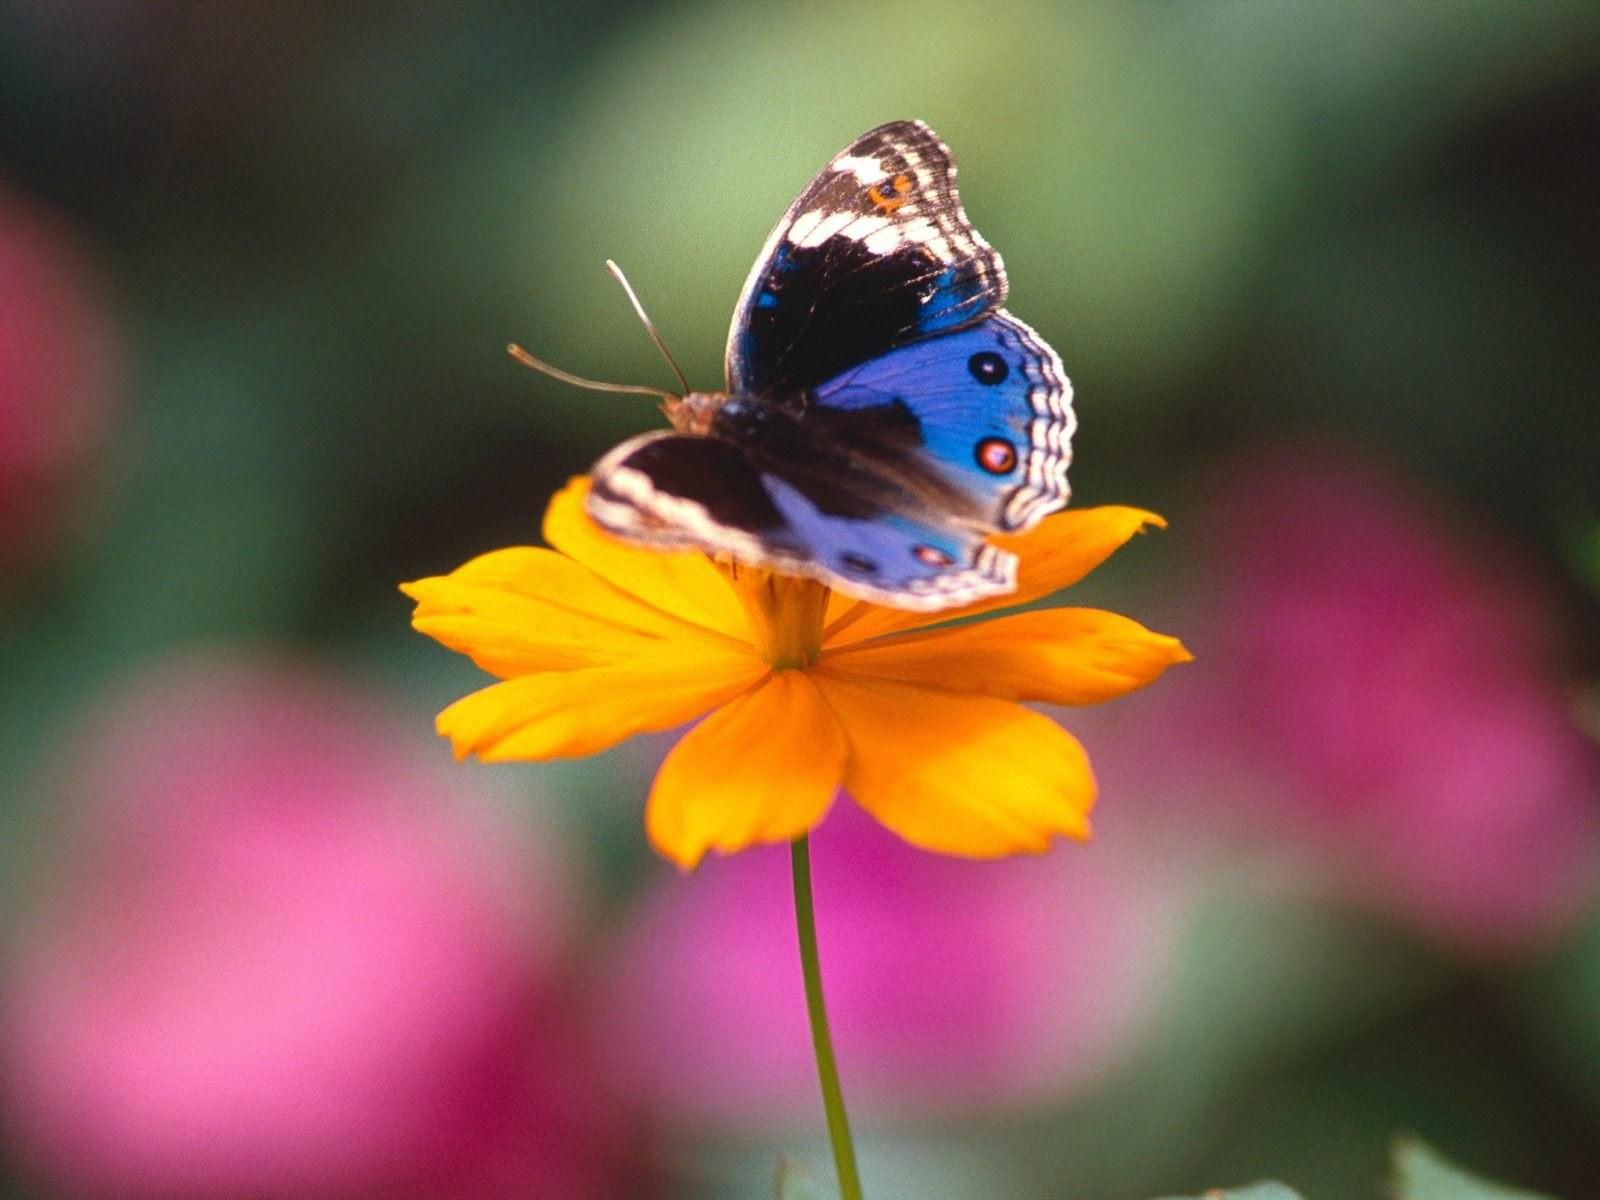 Синяя бабочка на желтом цветке